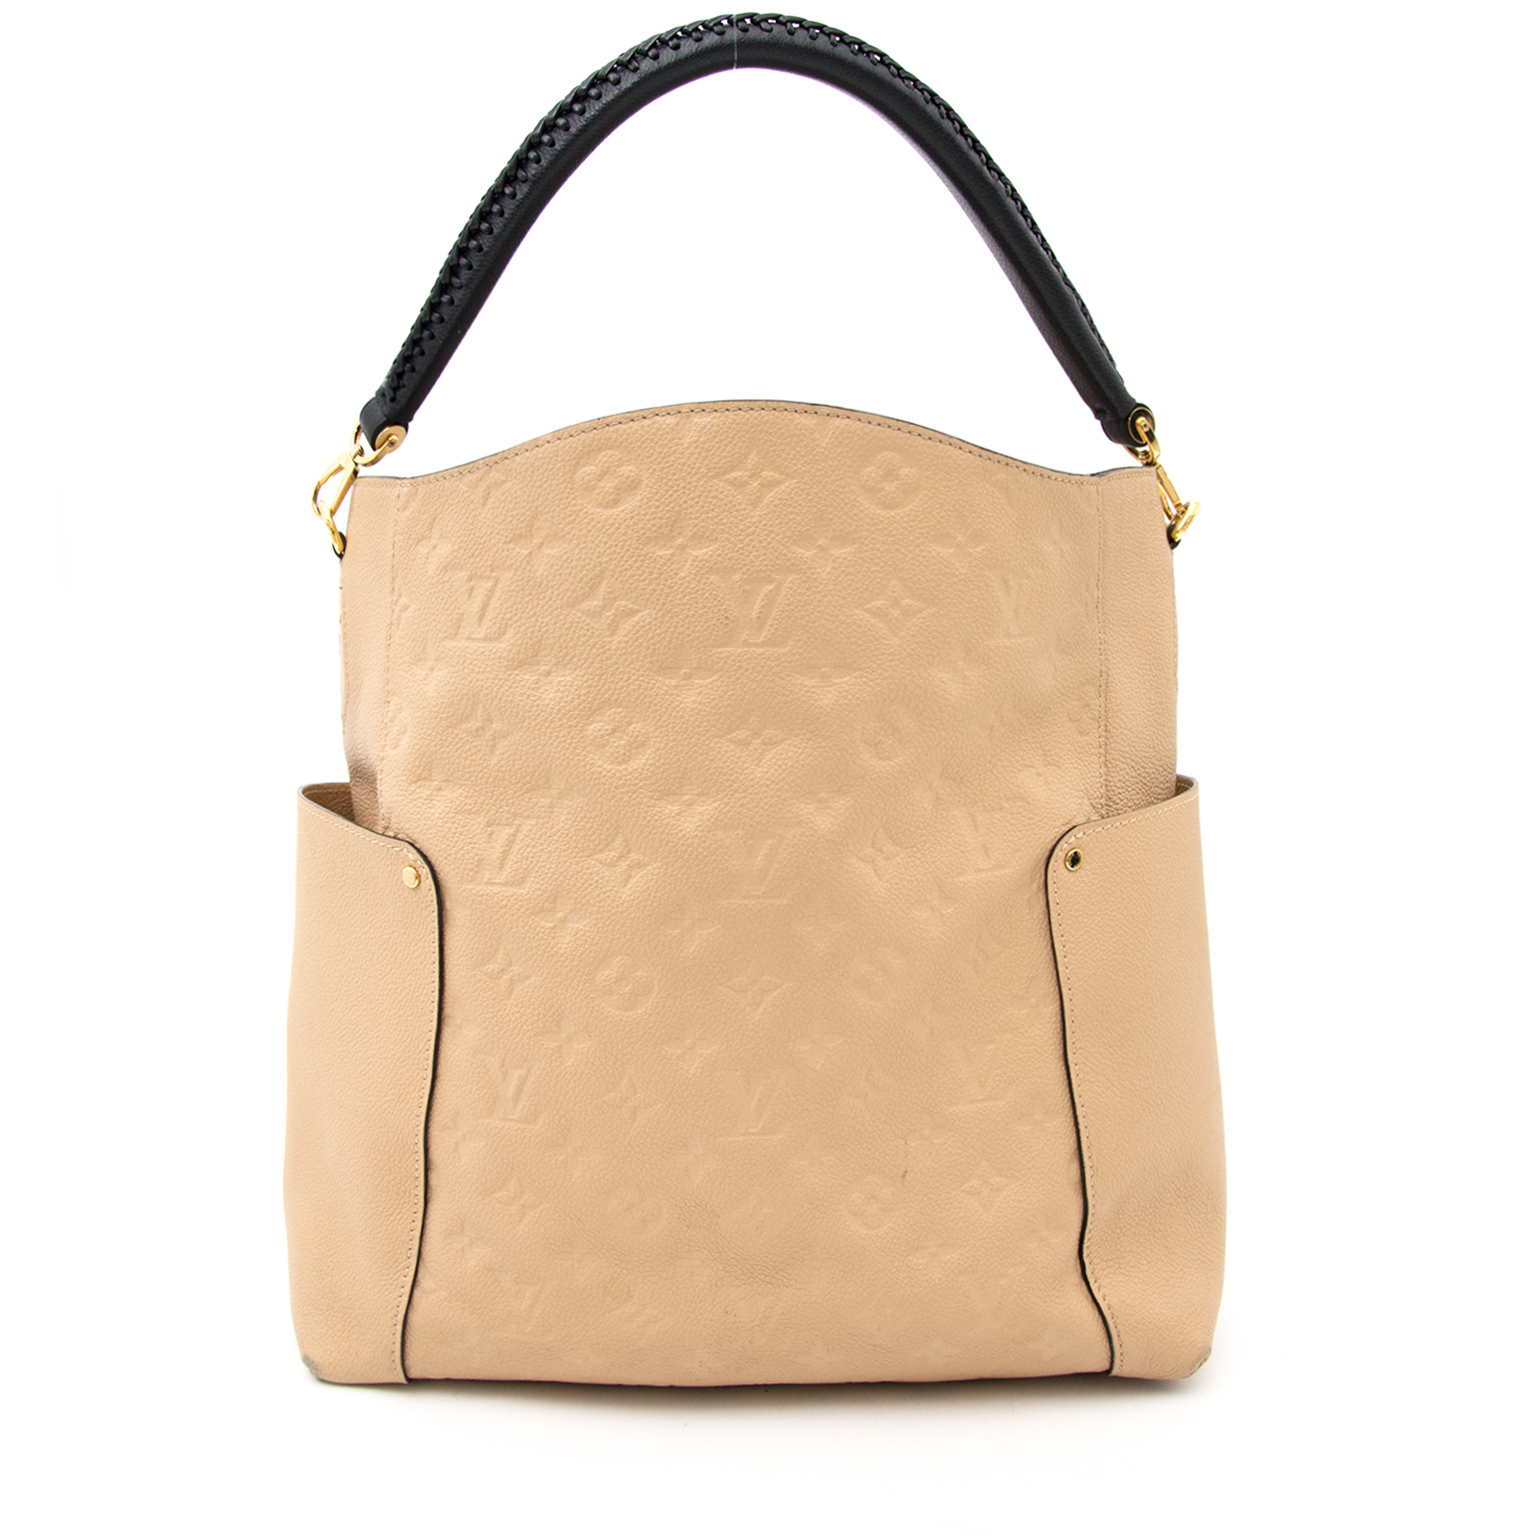 Buy a Louis Vuitton Beige Monogram online